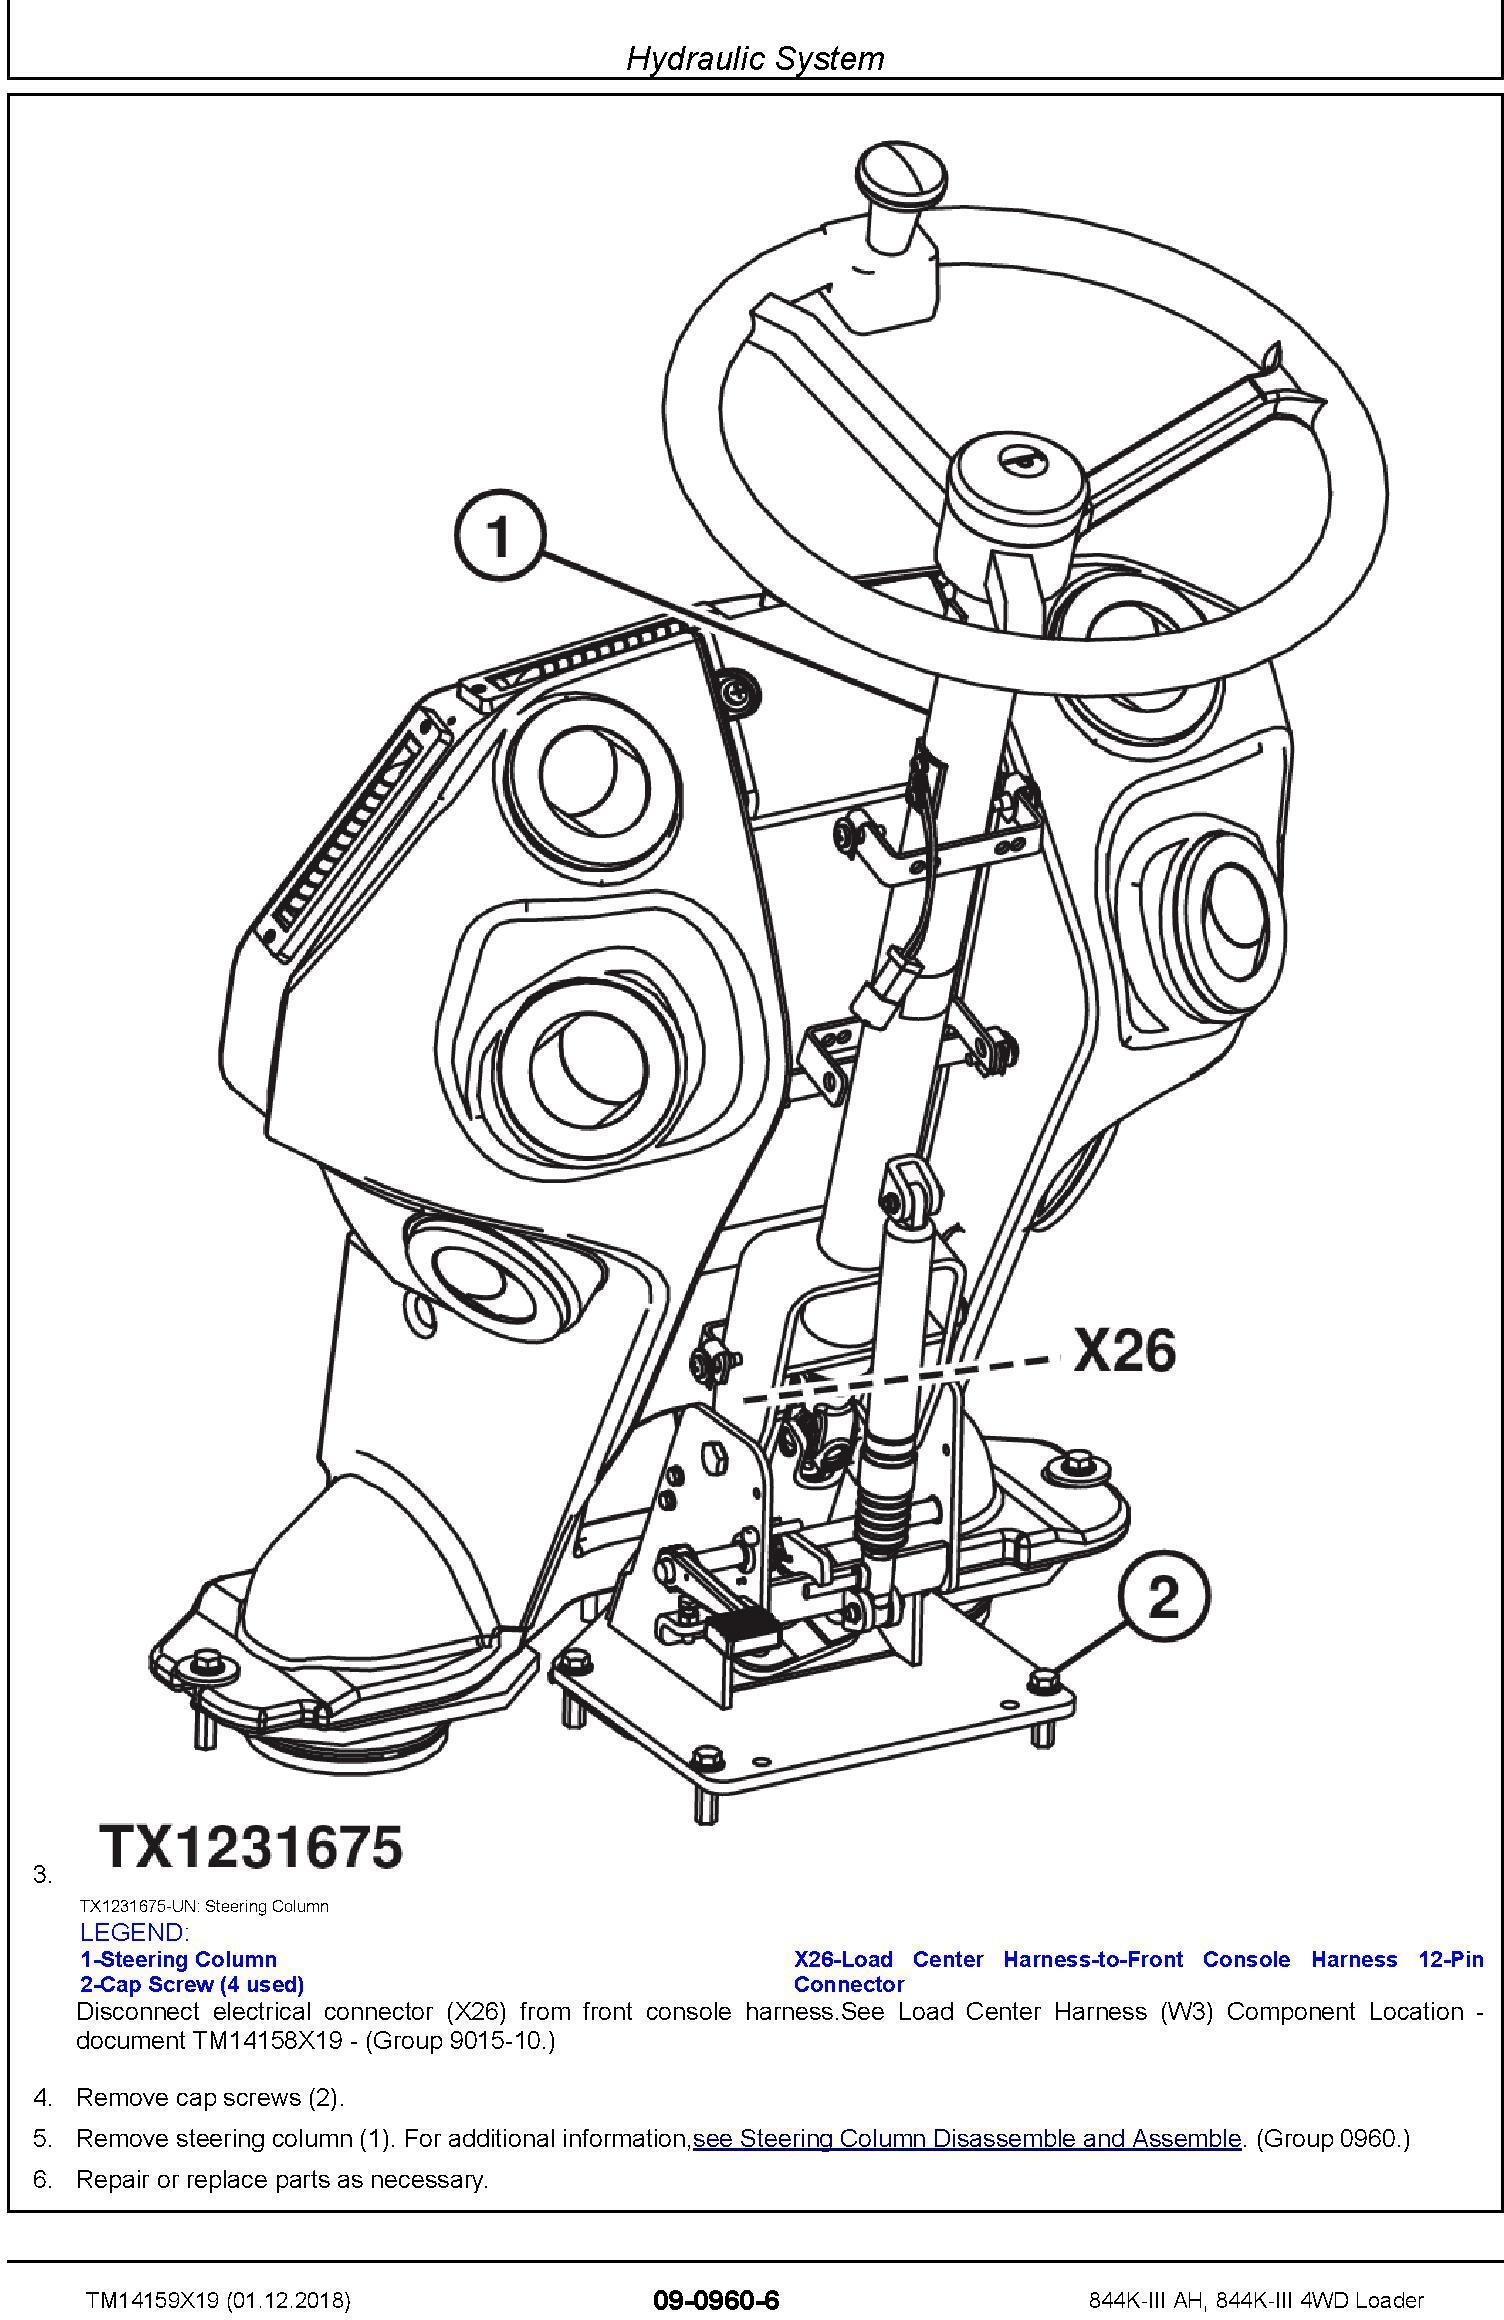 John Deere 844K-III (AH) SN. from F677782 4WD Loader Repair Technical Service Manual (TM14159X19) - 3